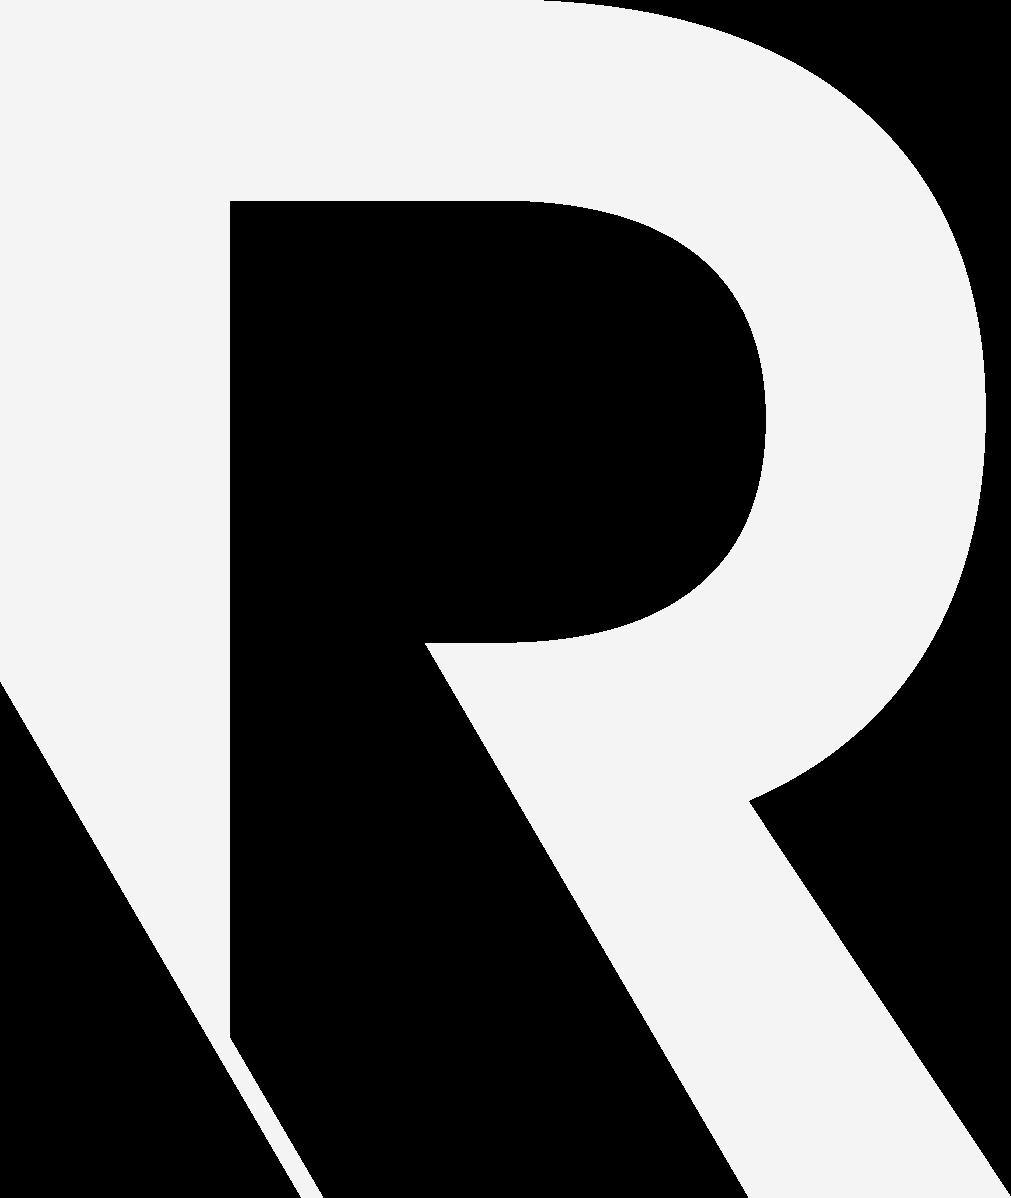 r-logo-bg-icon